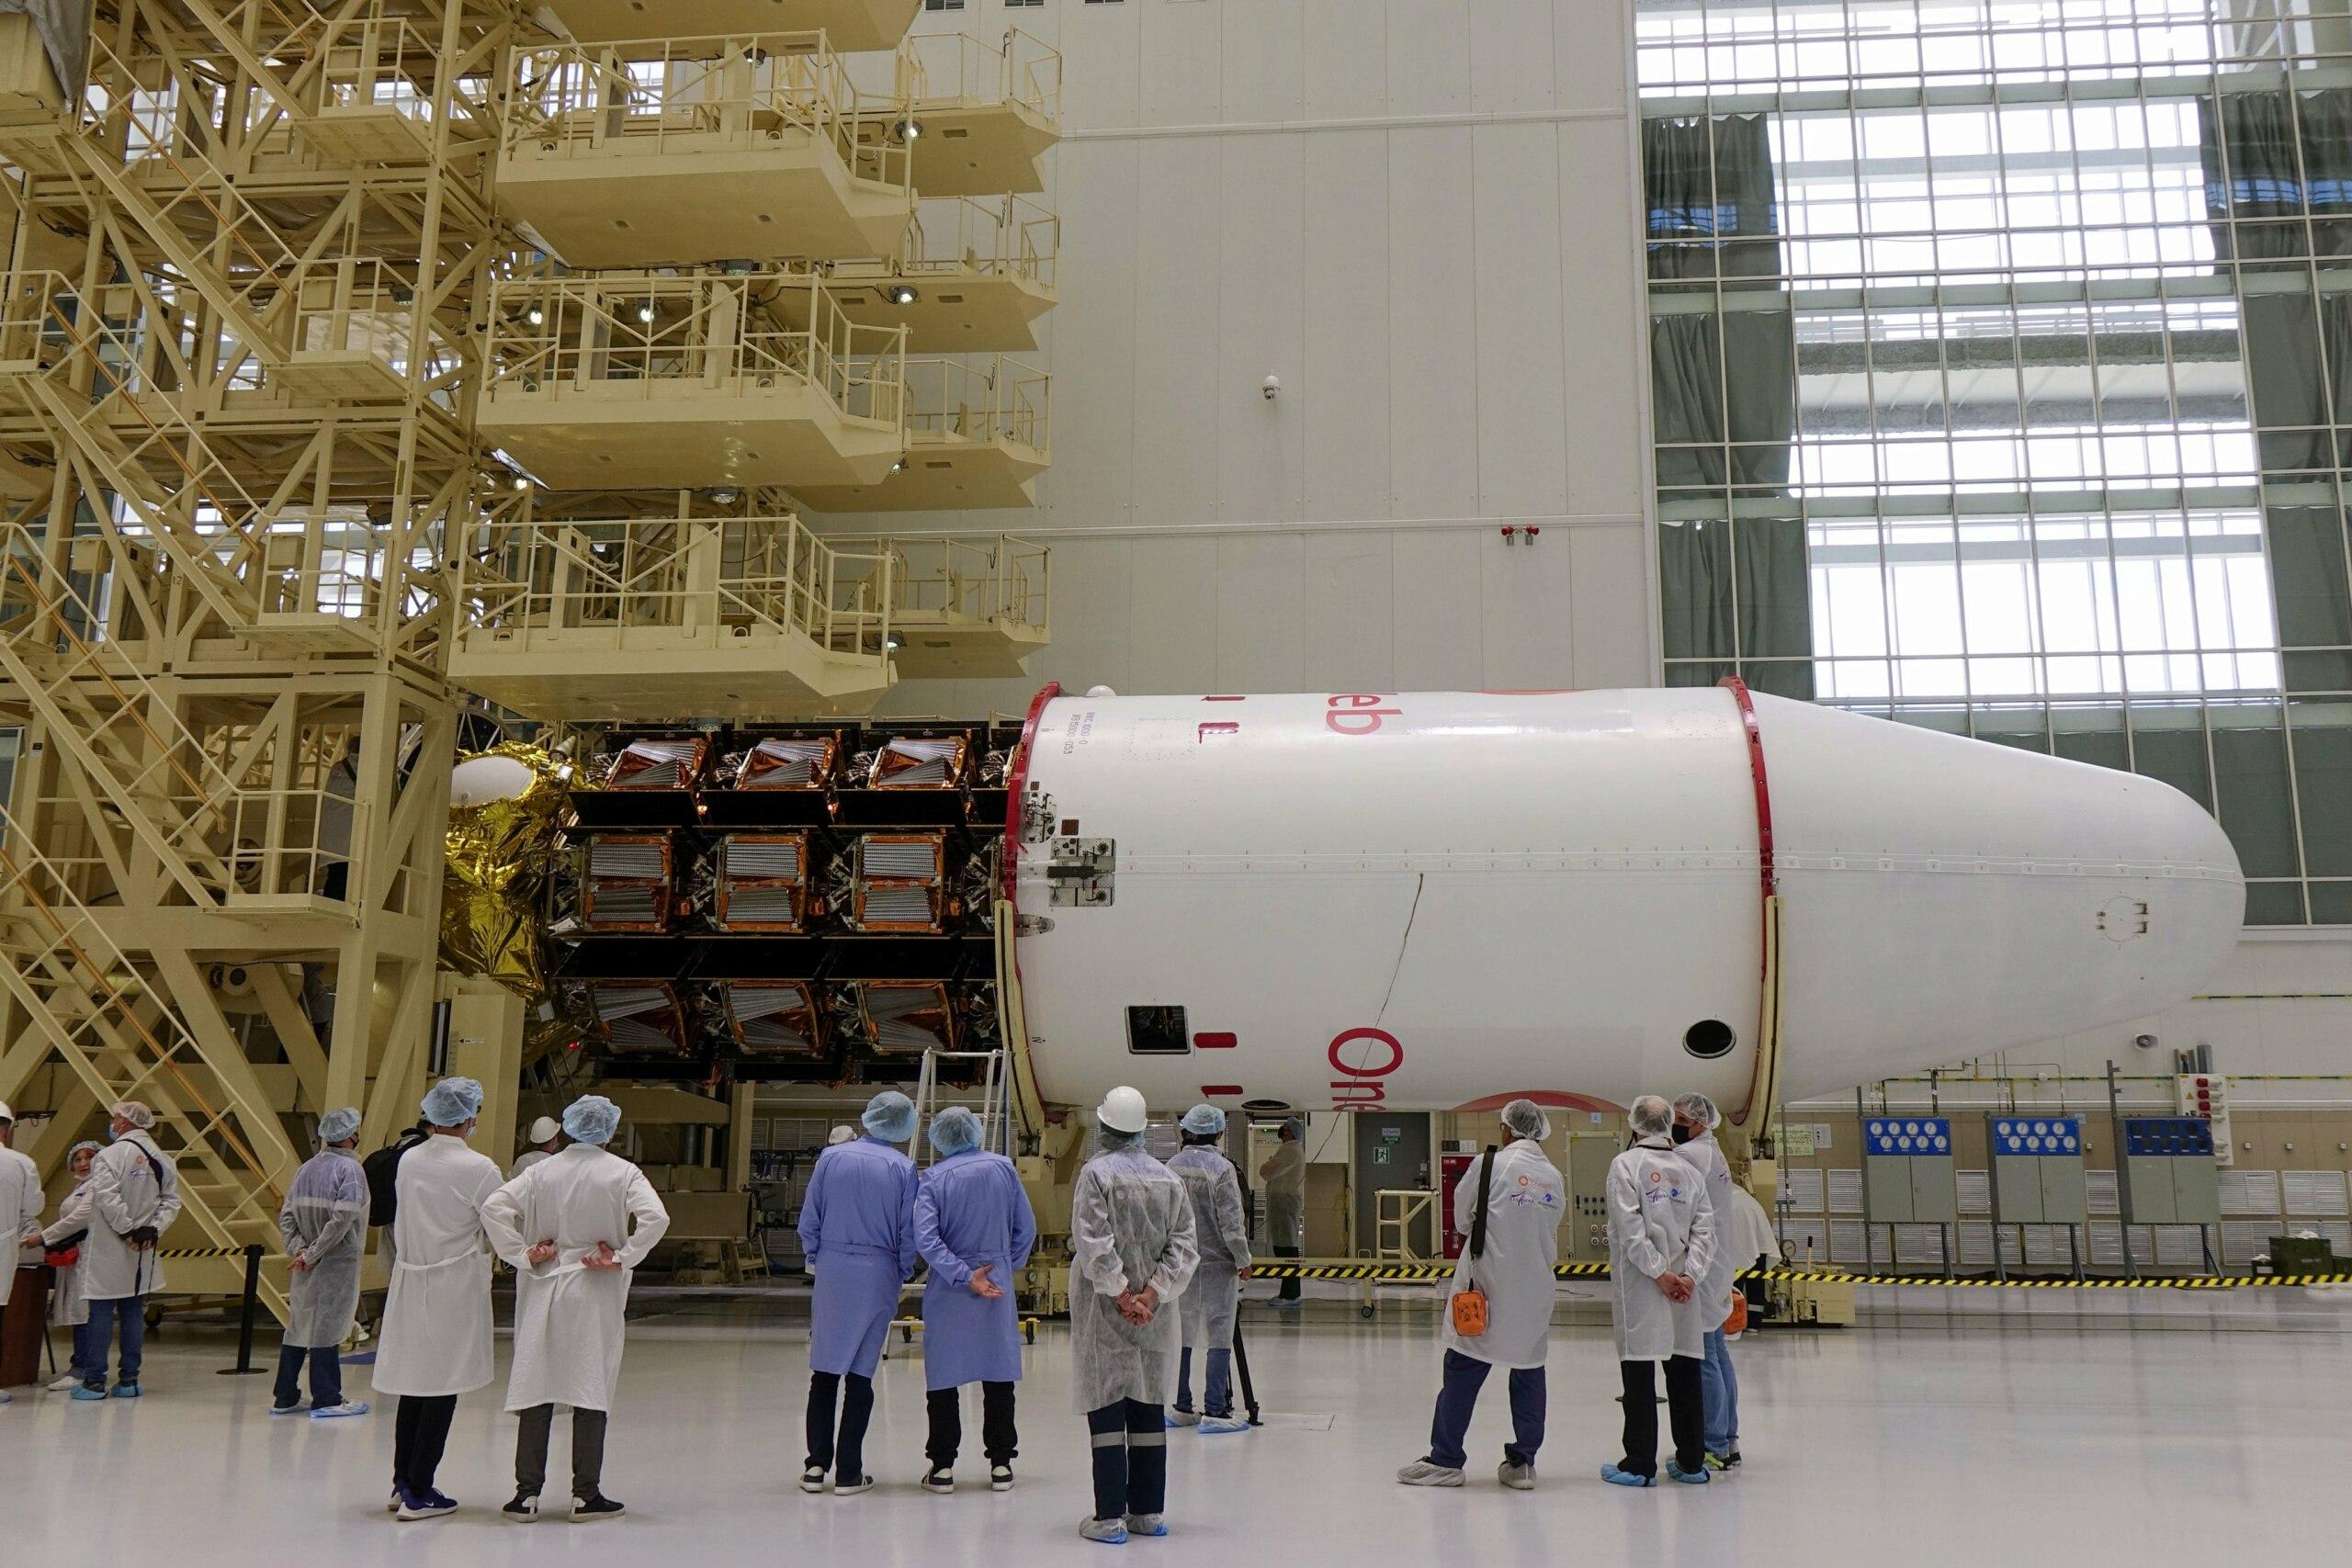 Soyouz-2.1b ST32 (OneWeb 7) - Vos - 28.5.2021 2483